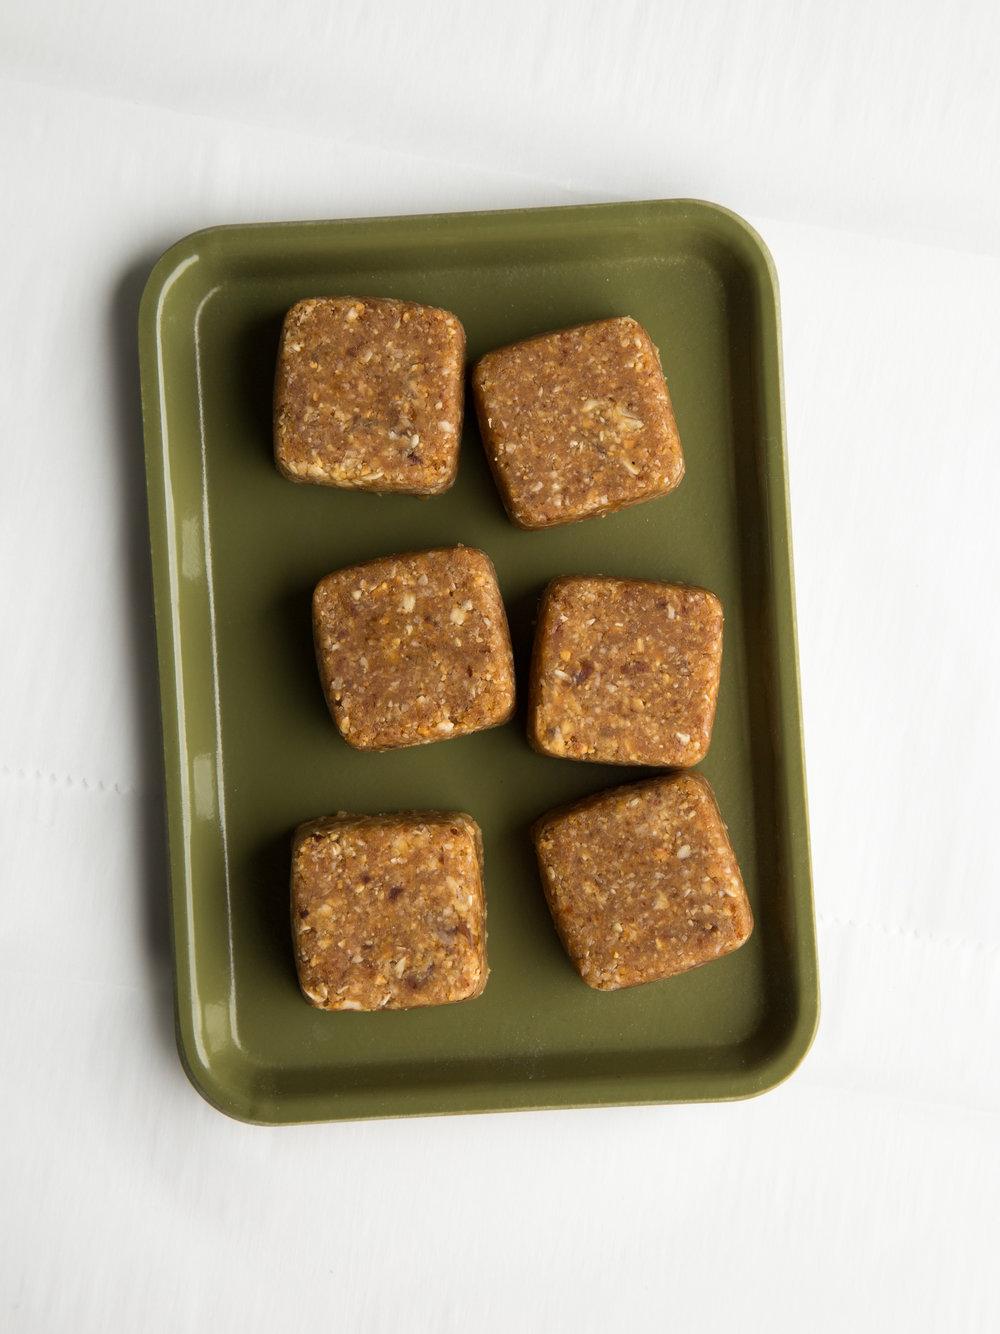 Peanut-butter-oat-bites